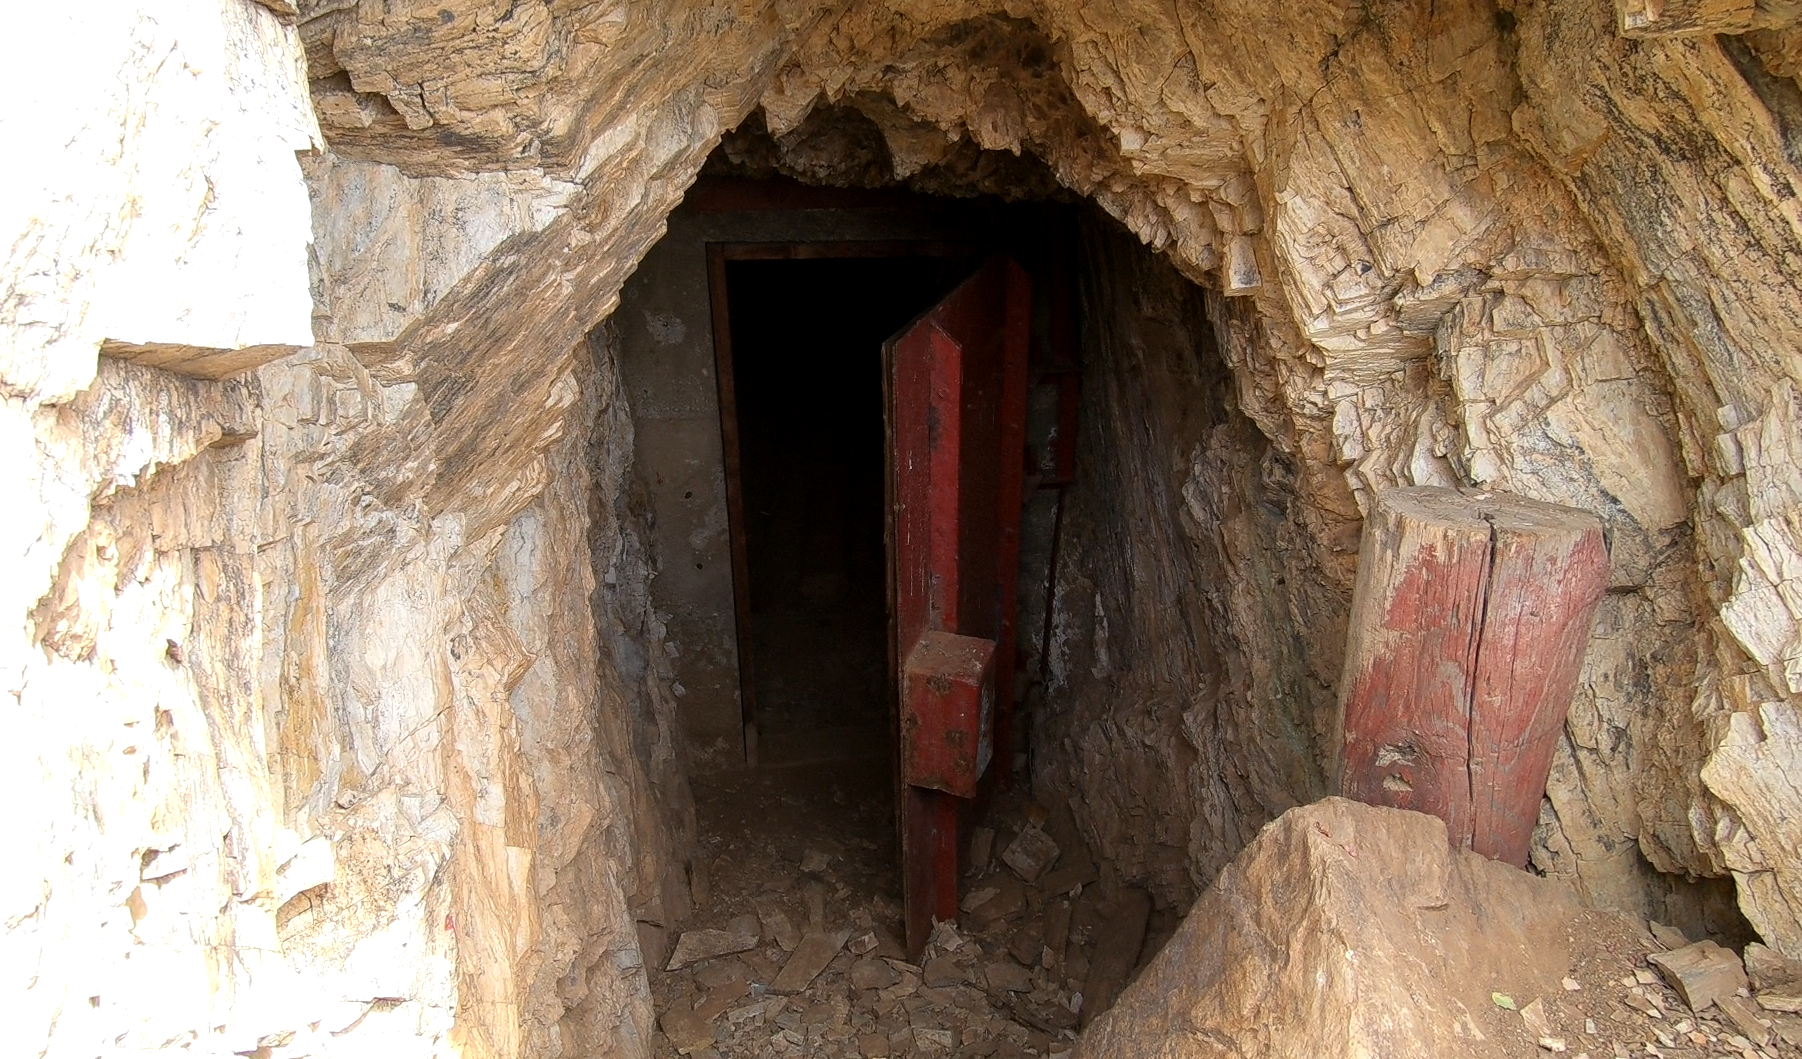 An explosives locker built into the hillside east of the Blue Bell.